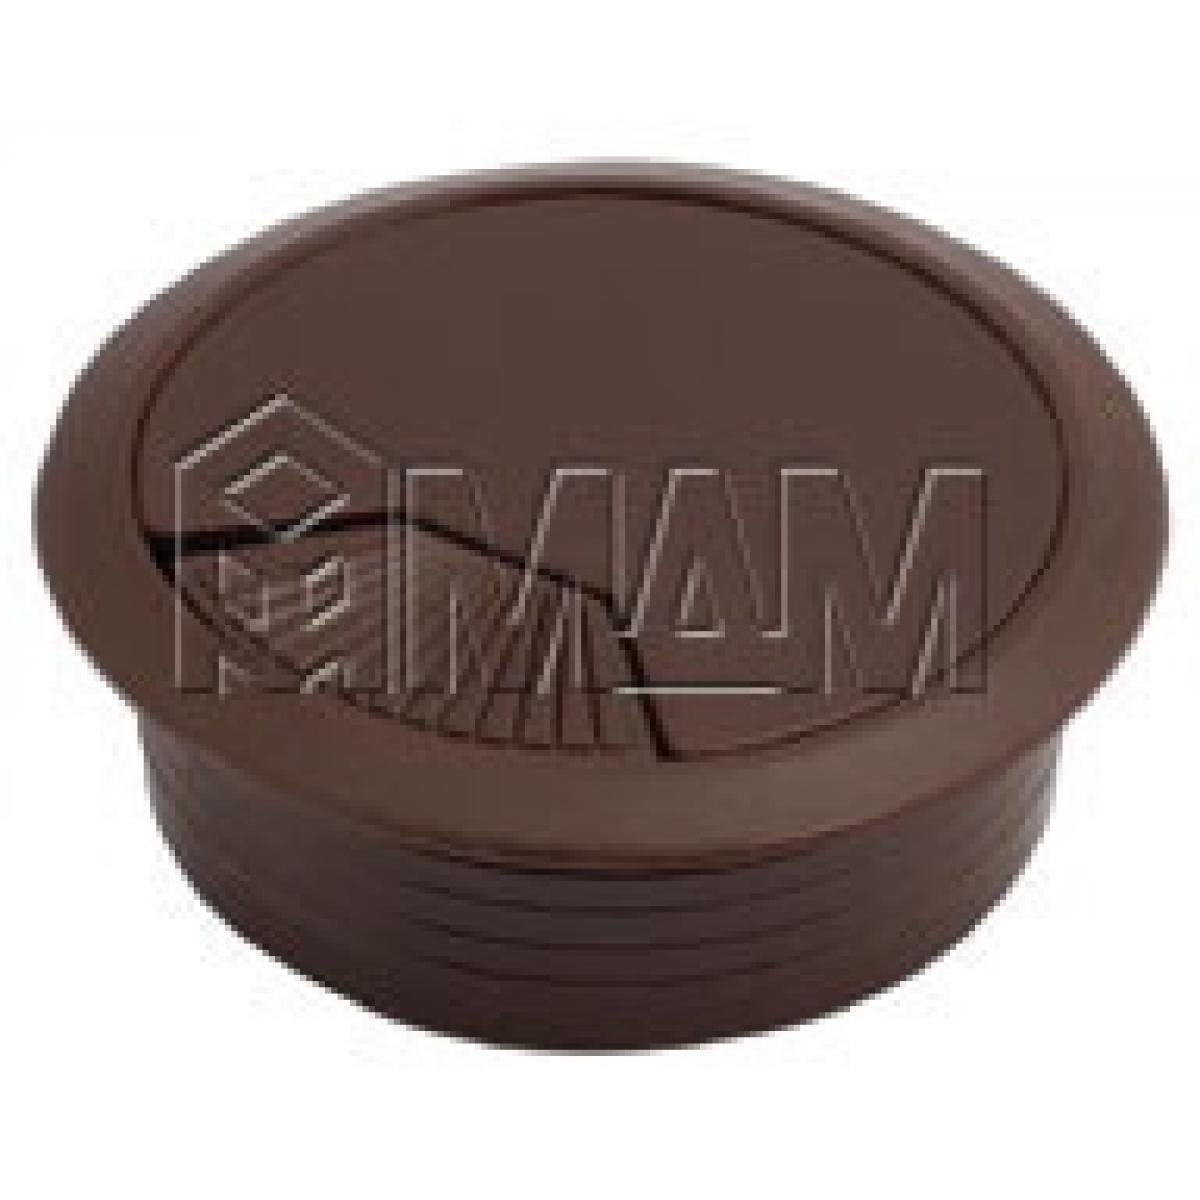 Заглушка кабель-канала, пластиковая, круглая, d=60 мм, темно-коричневая